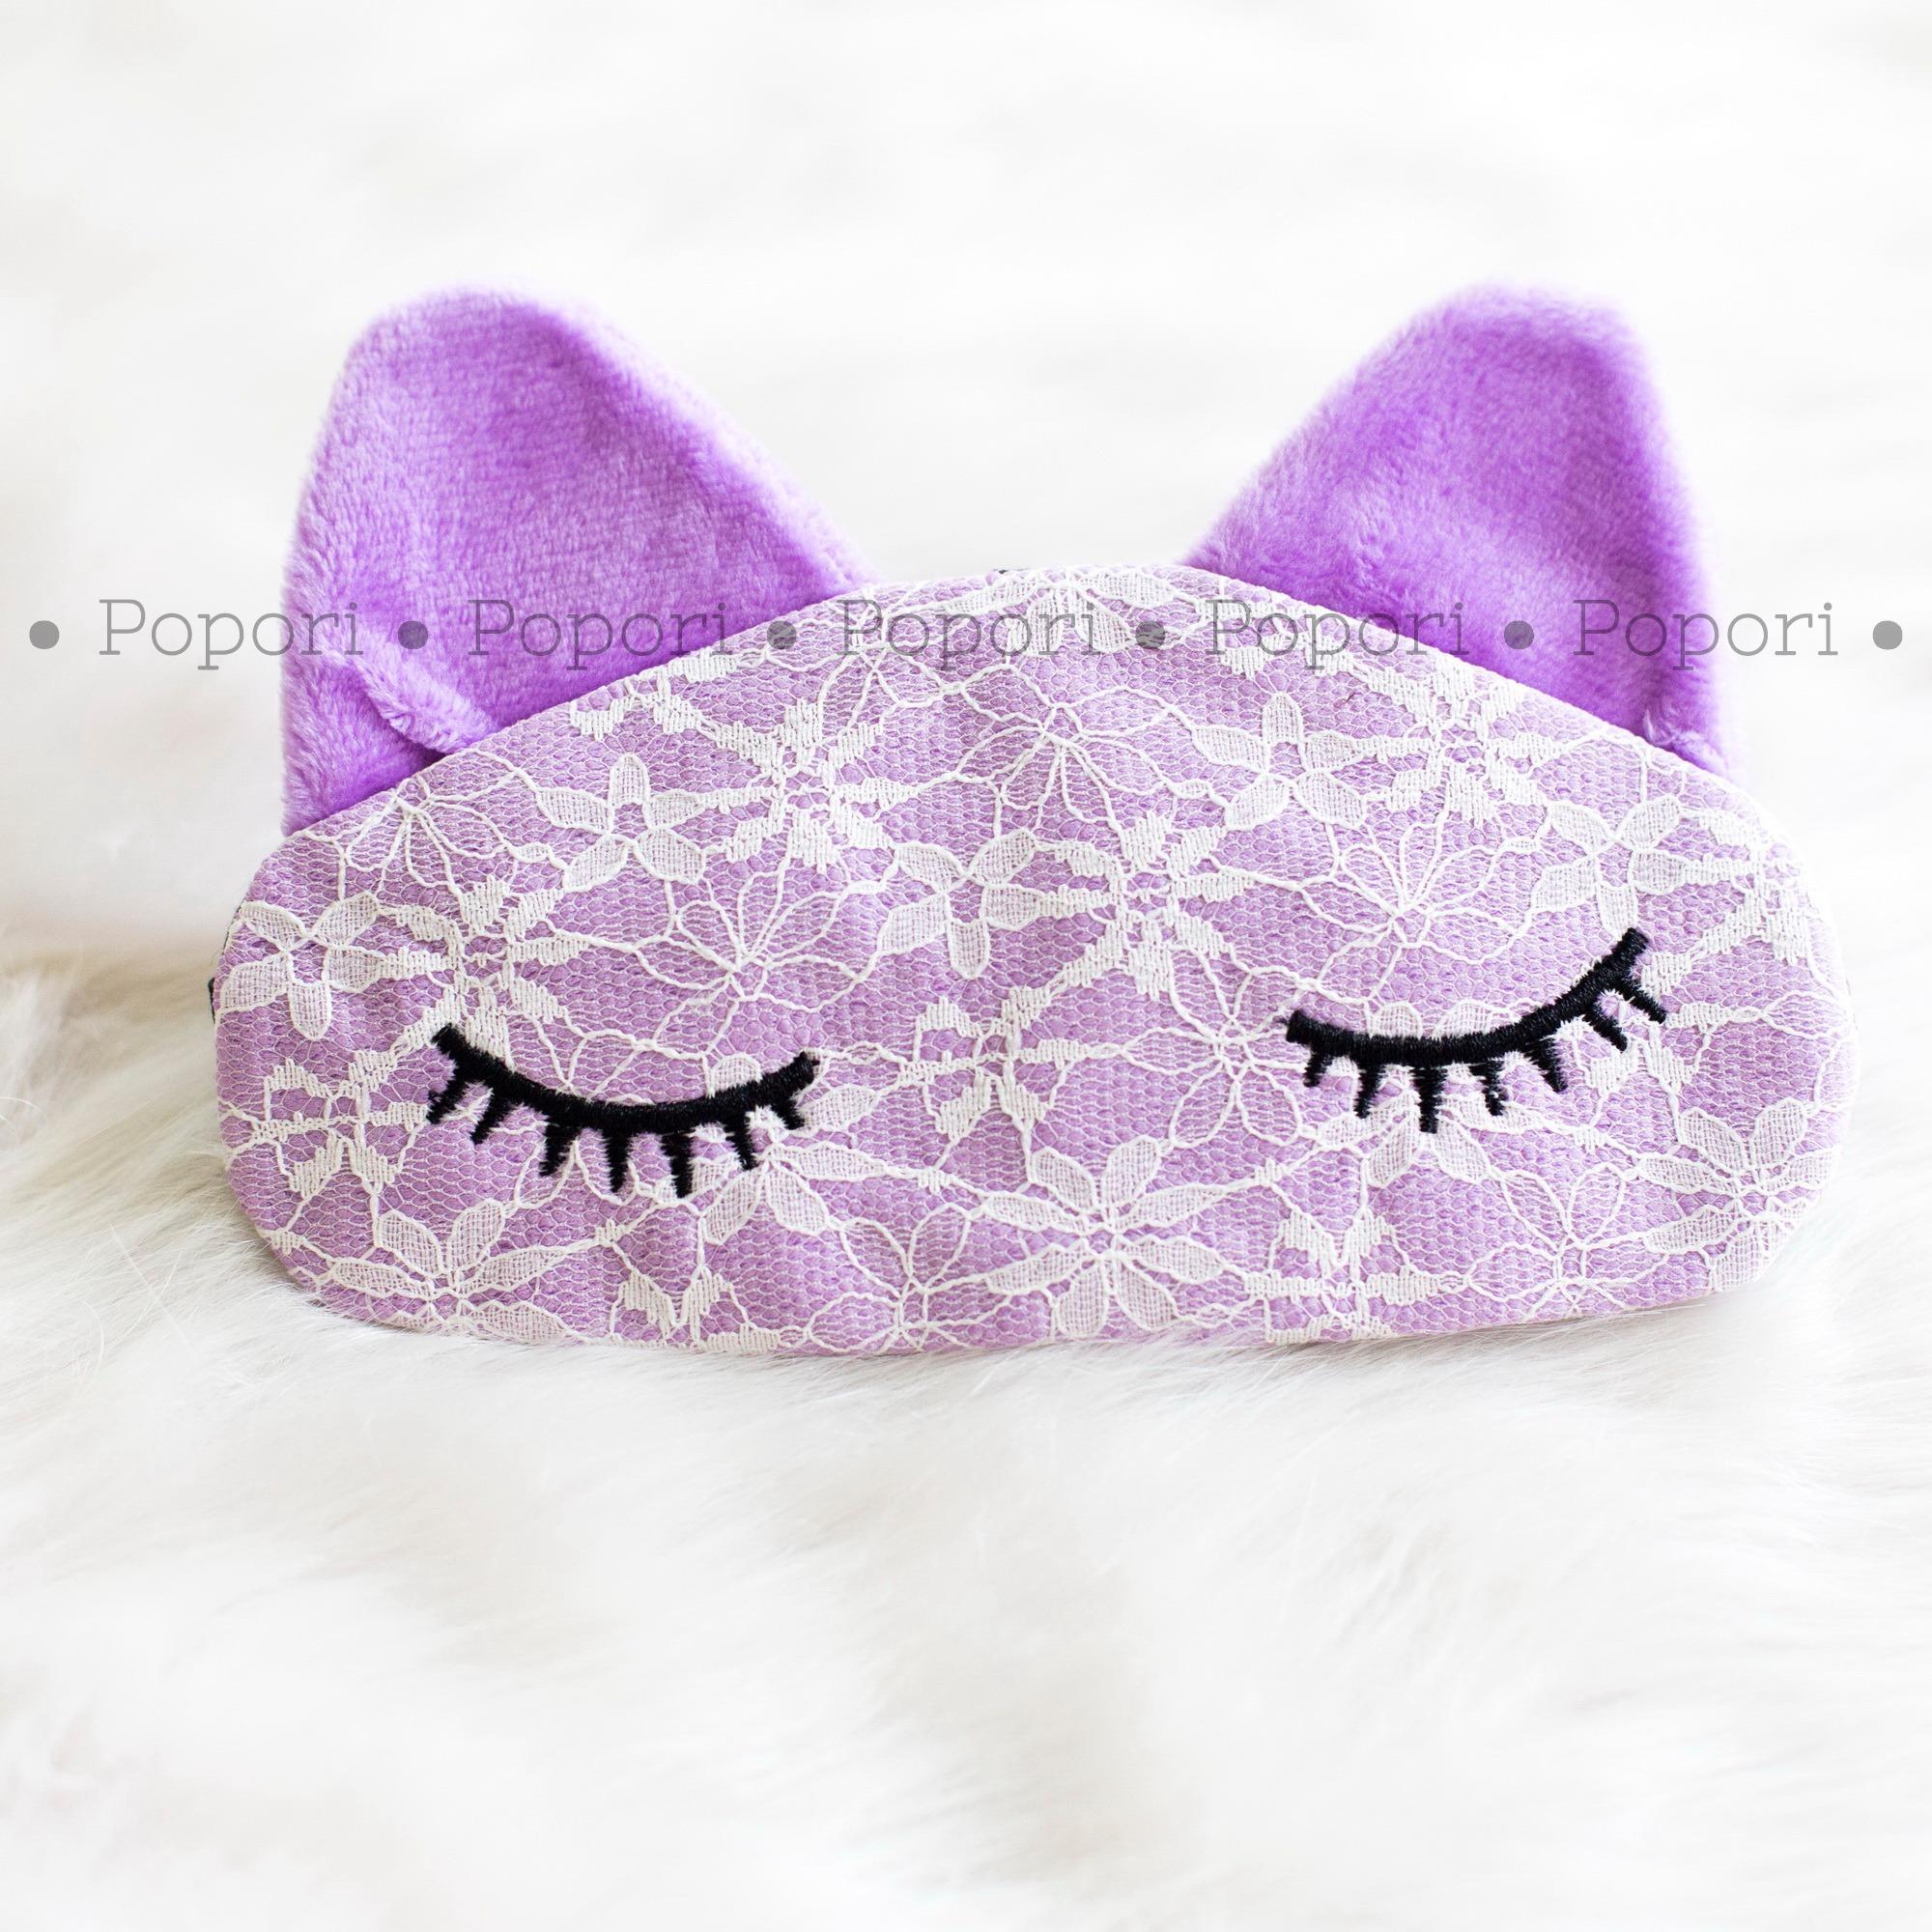 Pola Yang Lucu Masker Mata Pendingin Hati Atau Tidur Untuk 3d Popori Penutup Kucing